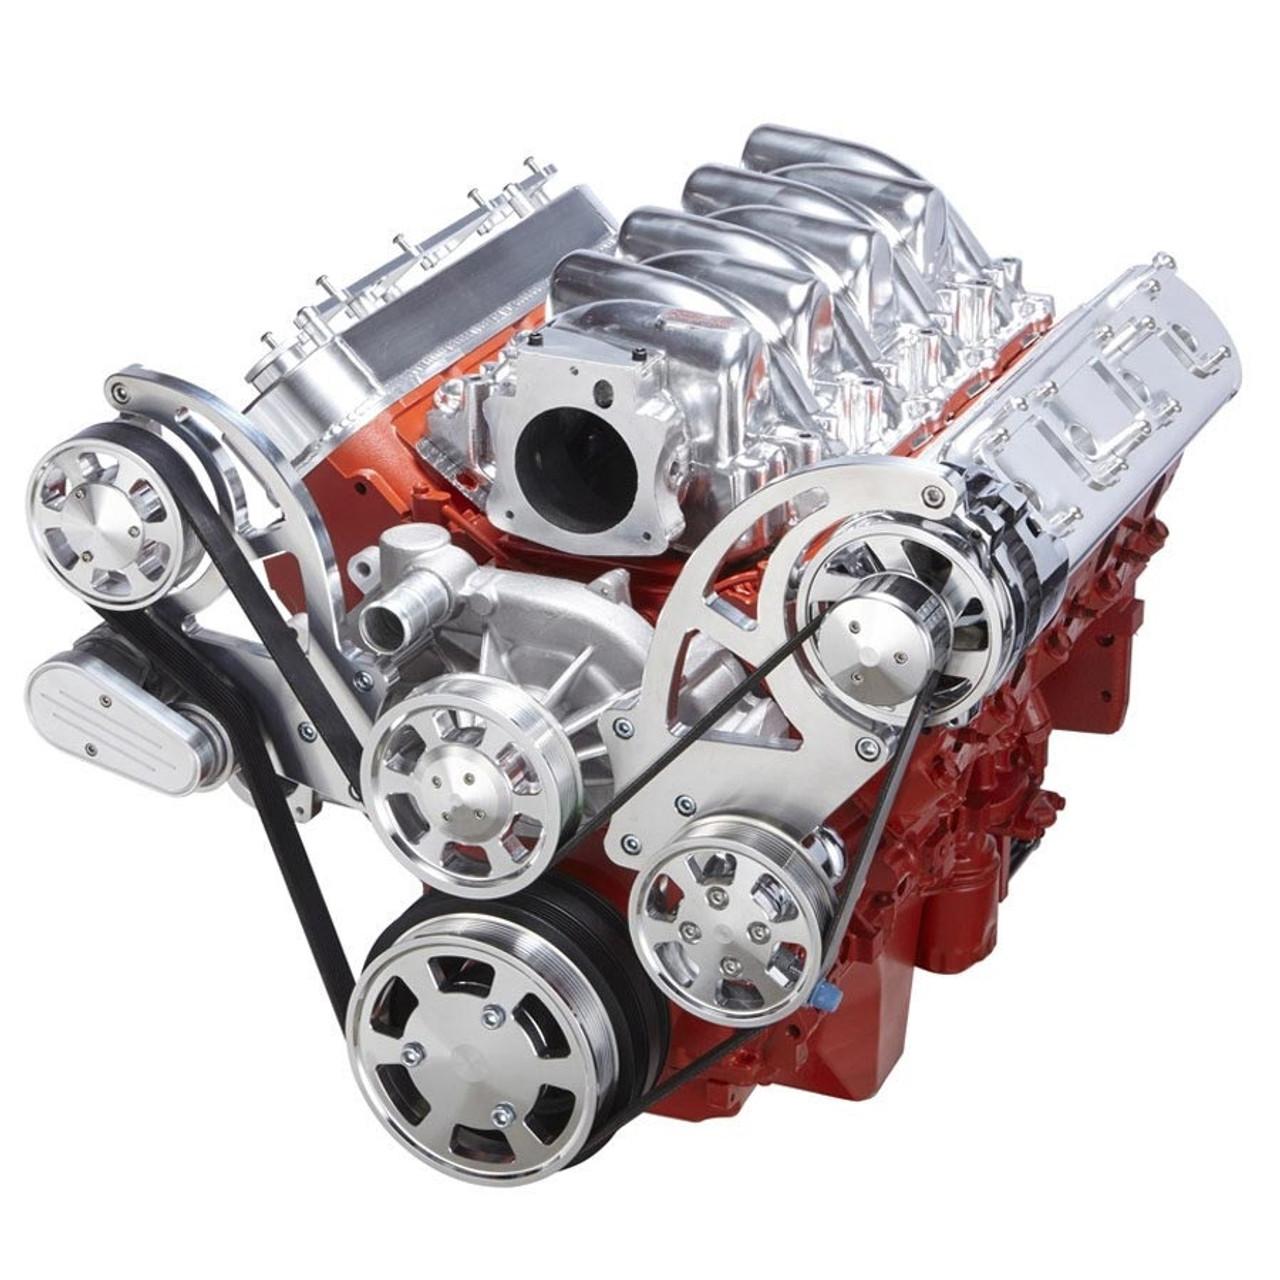 hight resolution of chevy ls serpentine kit power steering alternator